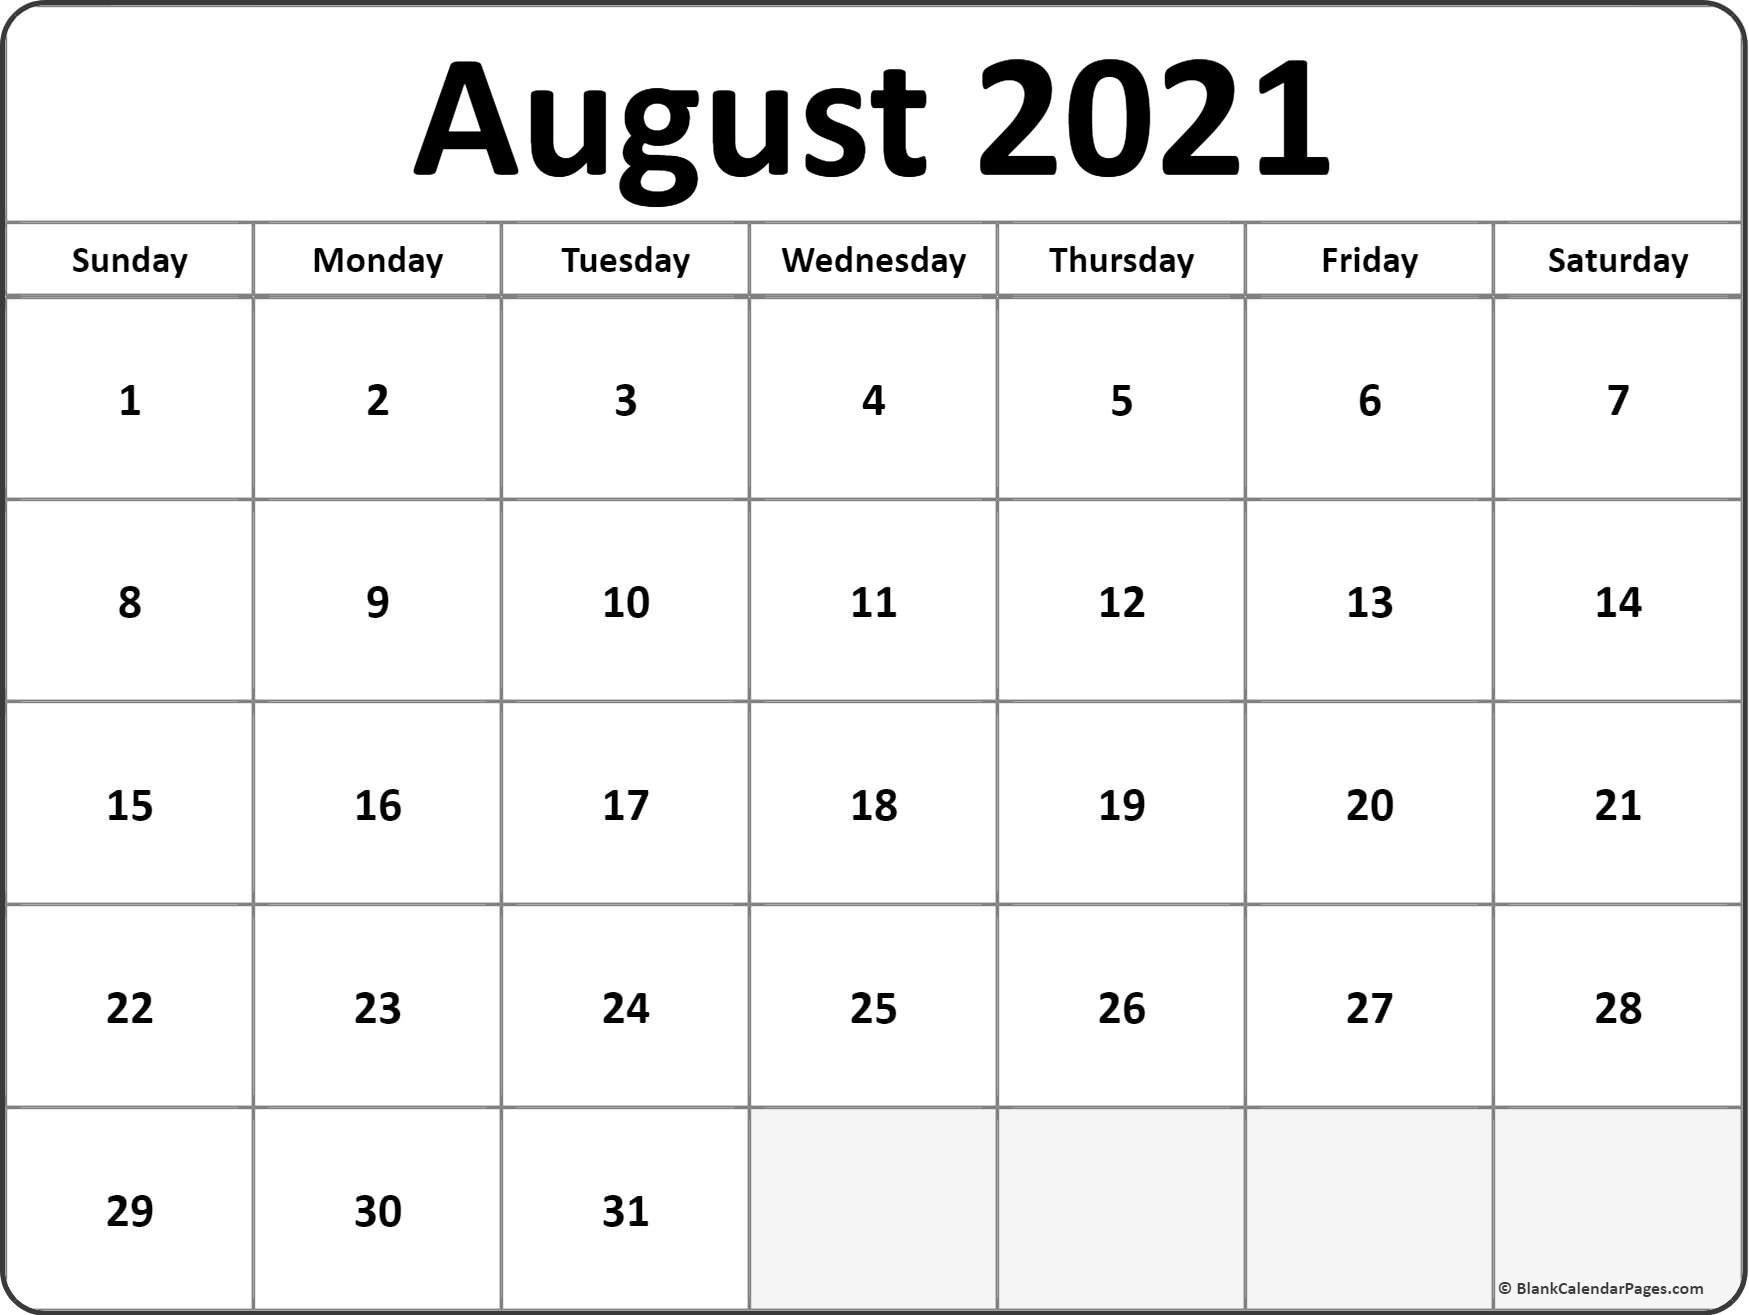 August 2021 Calendar   Free Printable Calendar inside Print Calendar 2021 Monthly Free Photo